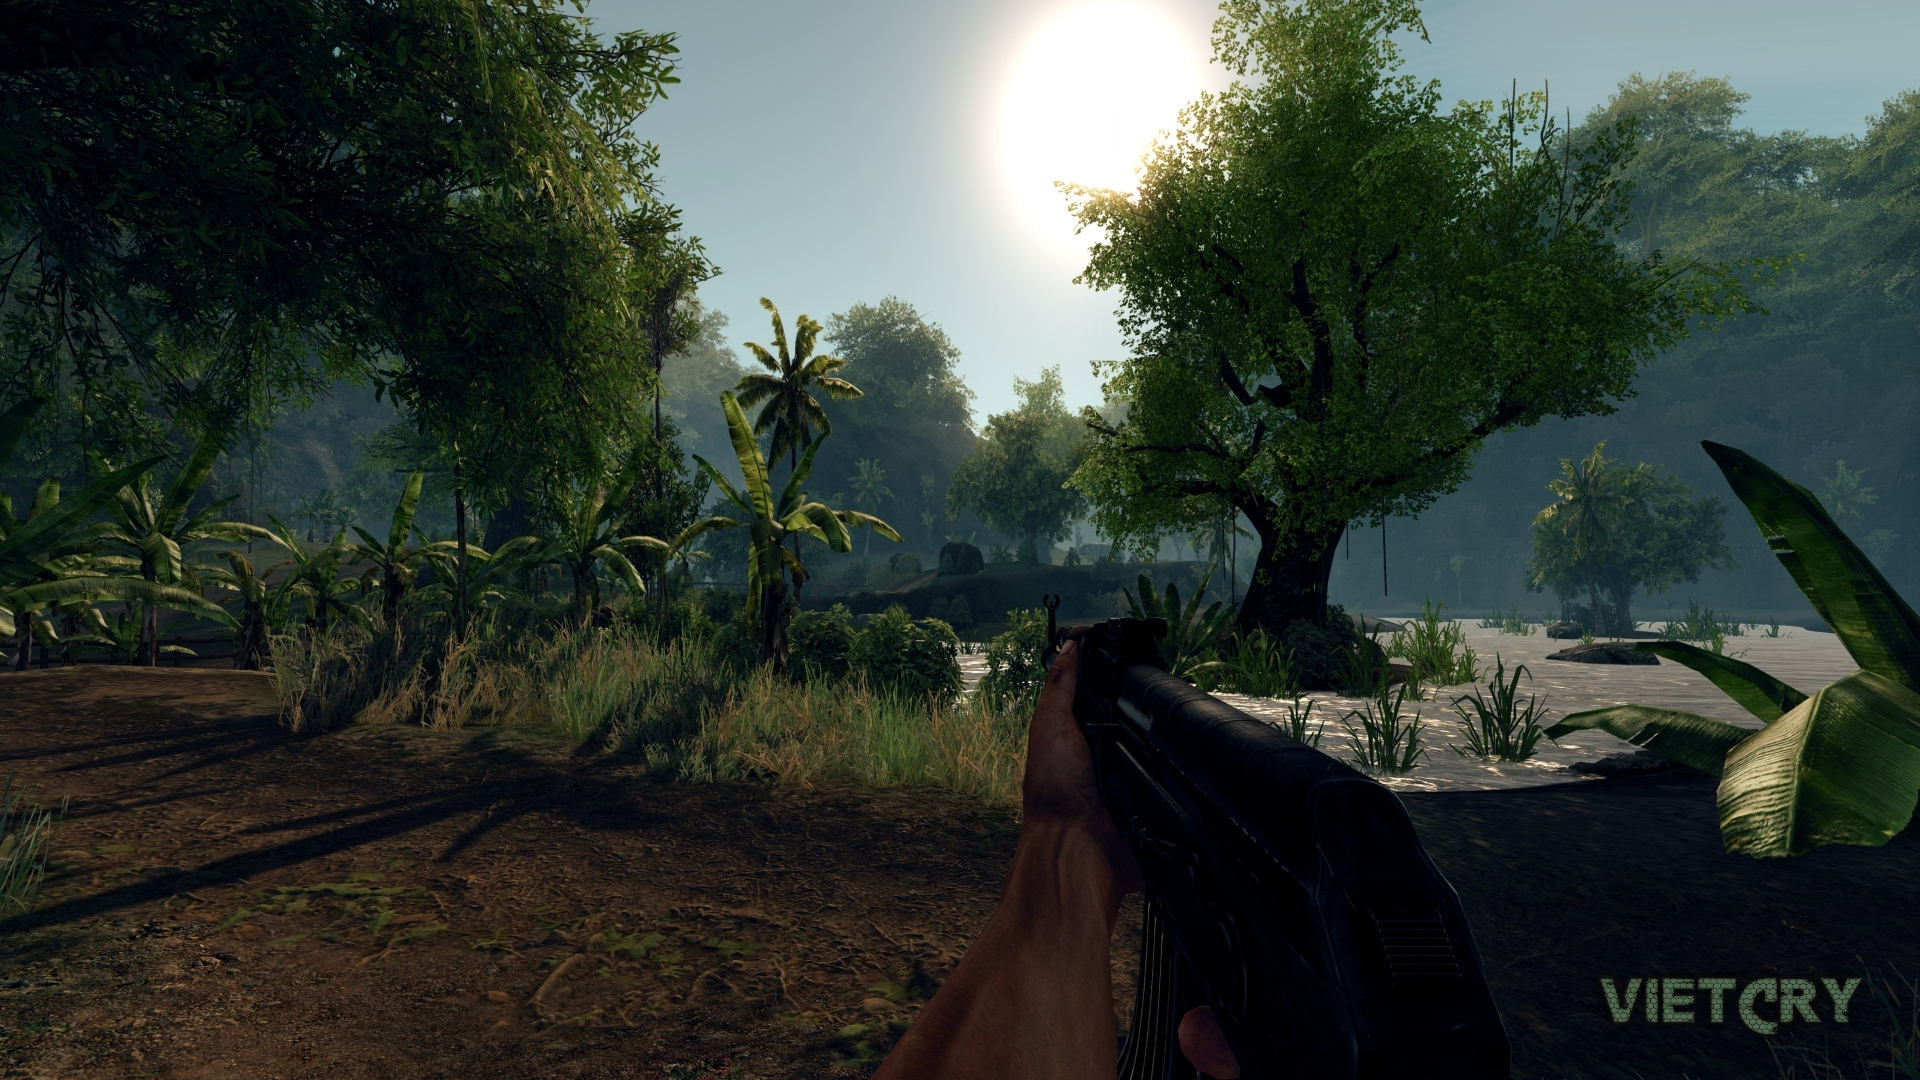 [Hot Mod] Vietcry (Vietnam War) - Crysis mod Vietcry_7w4769